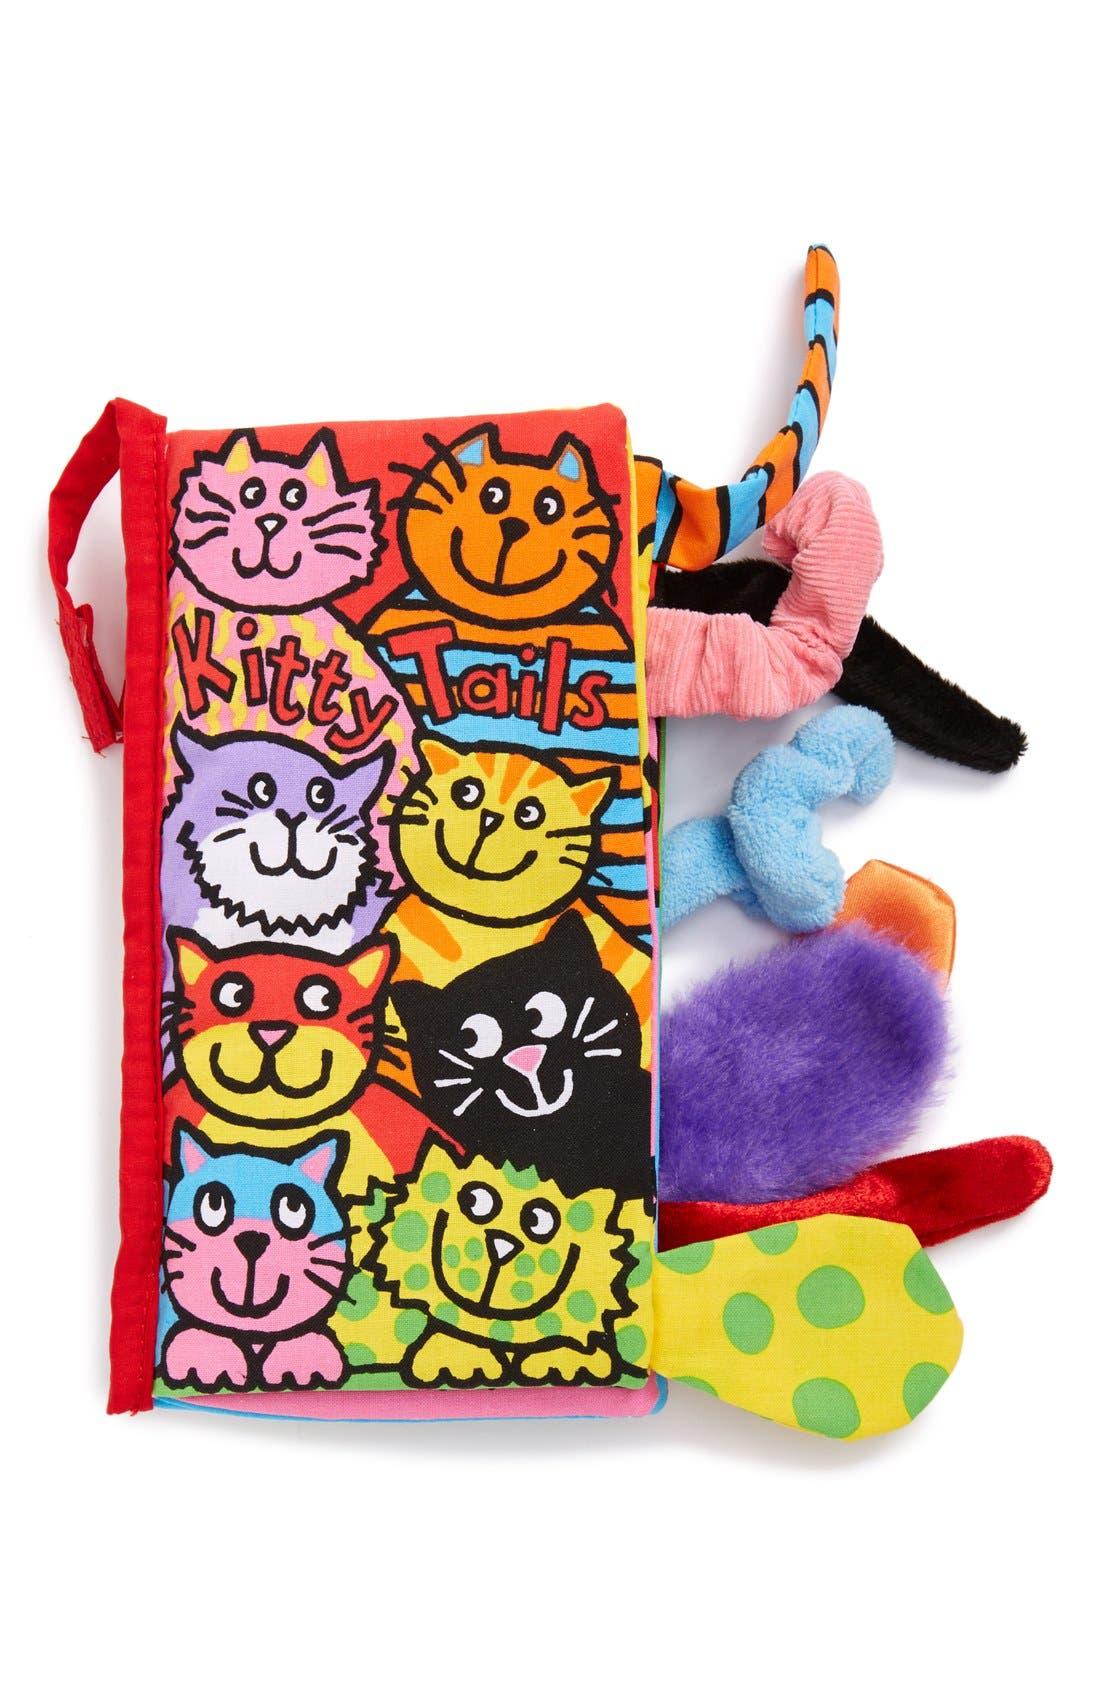 Main Image - 'Kitten Tails' Book